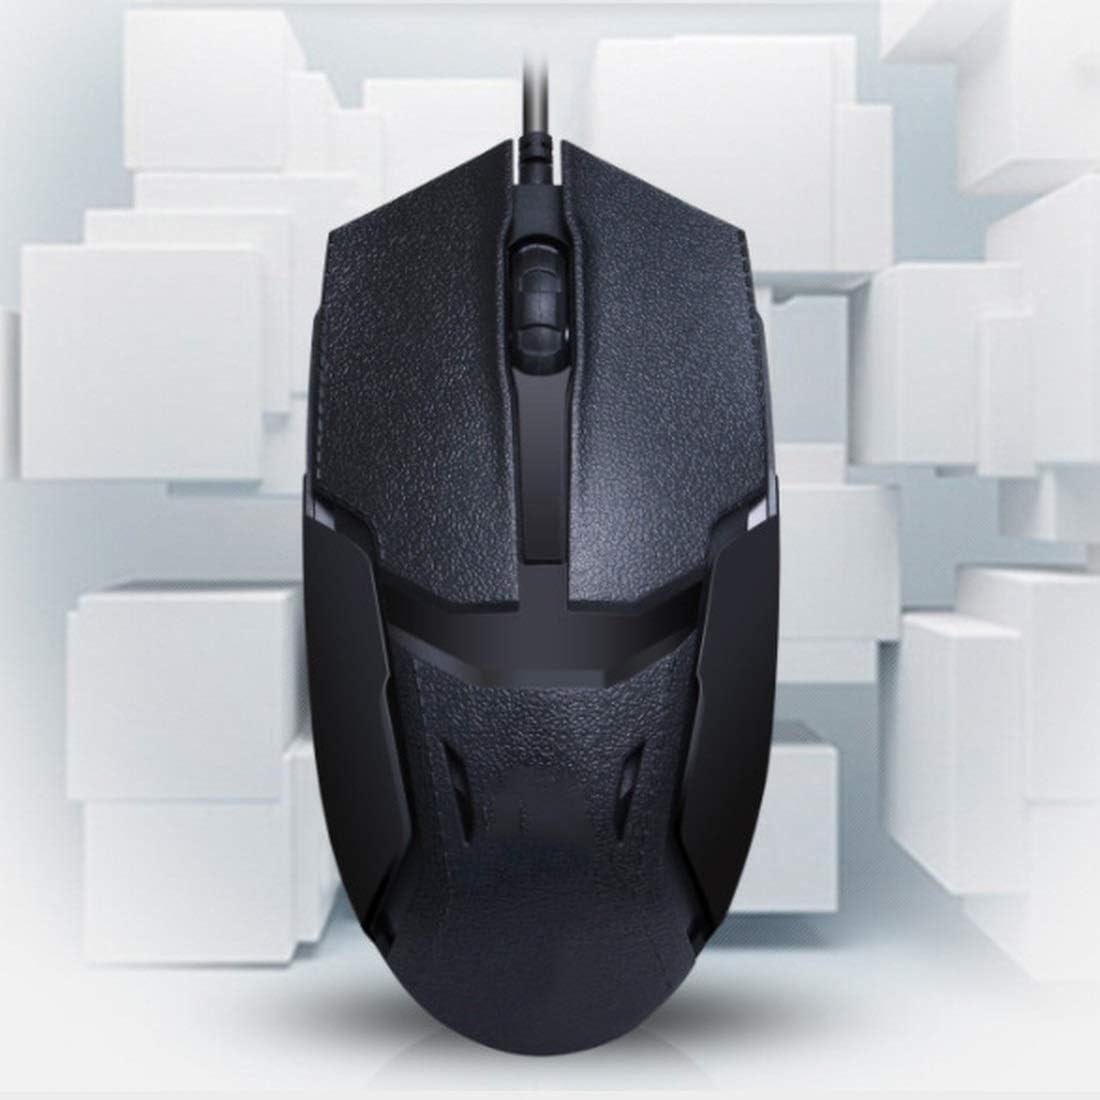 Computer Mouse Optical Mouse for PC Laptop Desktop Color : Black XIAMEND Gaming Mouse 1600 DPI Mac